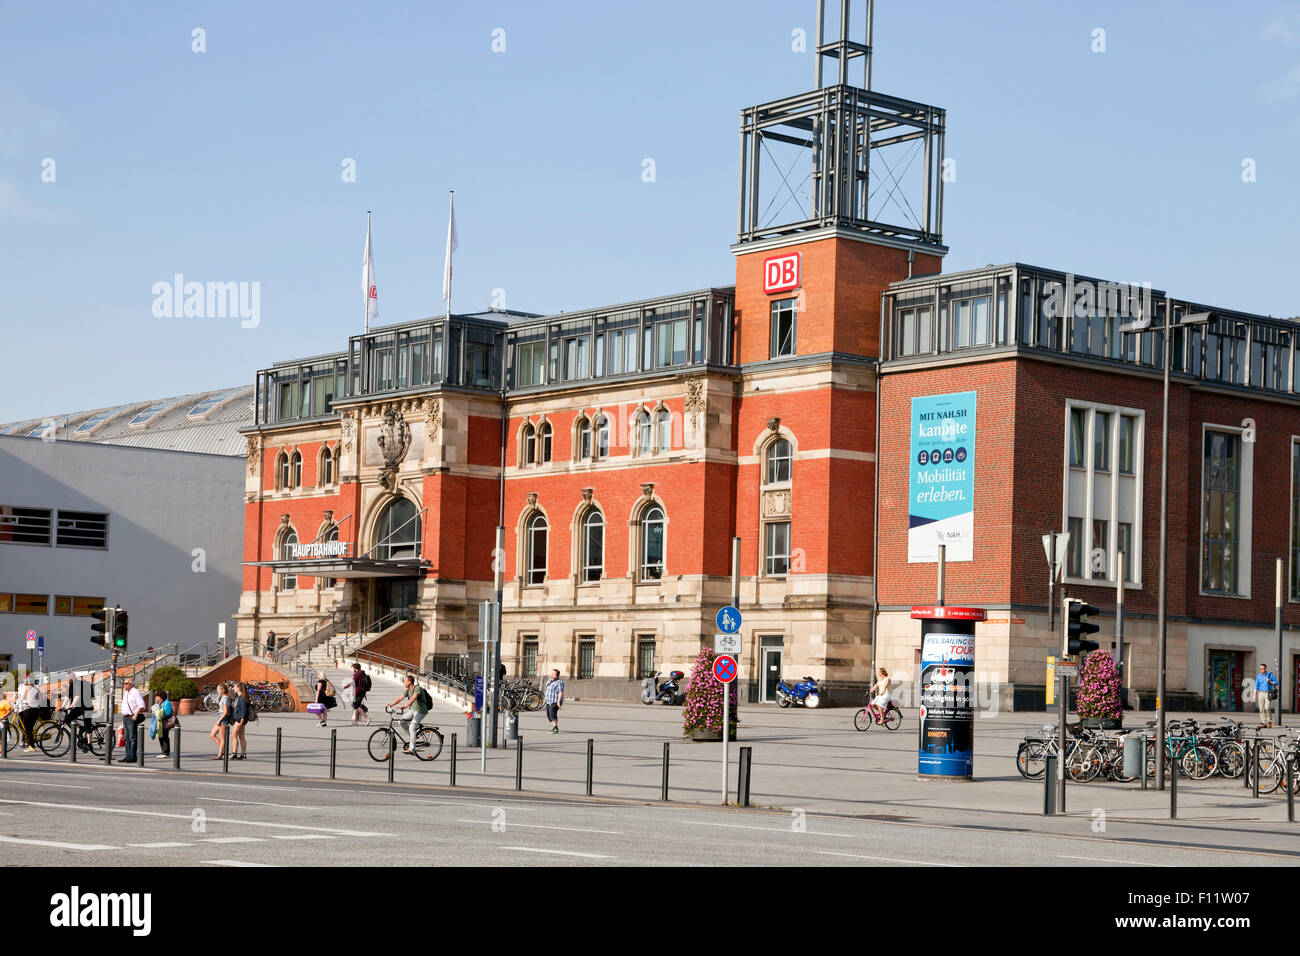 main train station, Kiel, Schleswig-Holstein, Germany - Stock Image